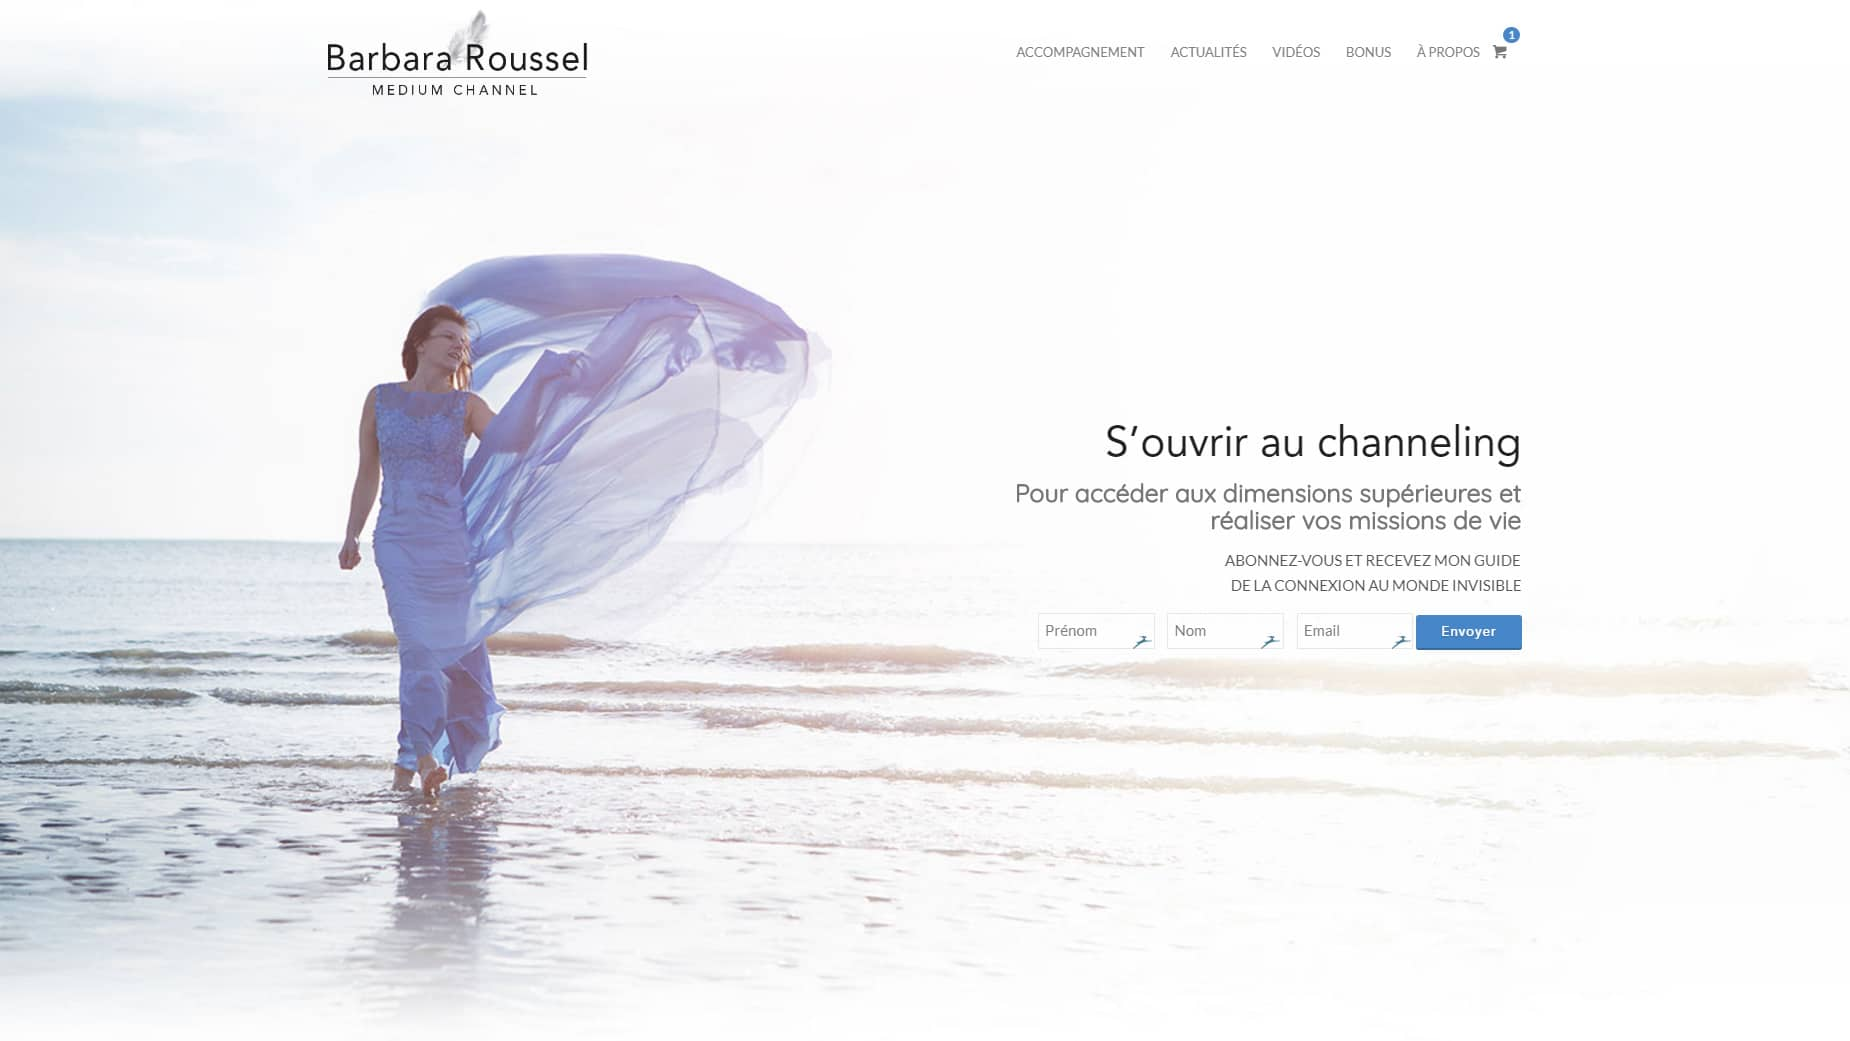 Barbara Roussel medium channel